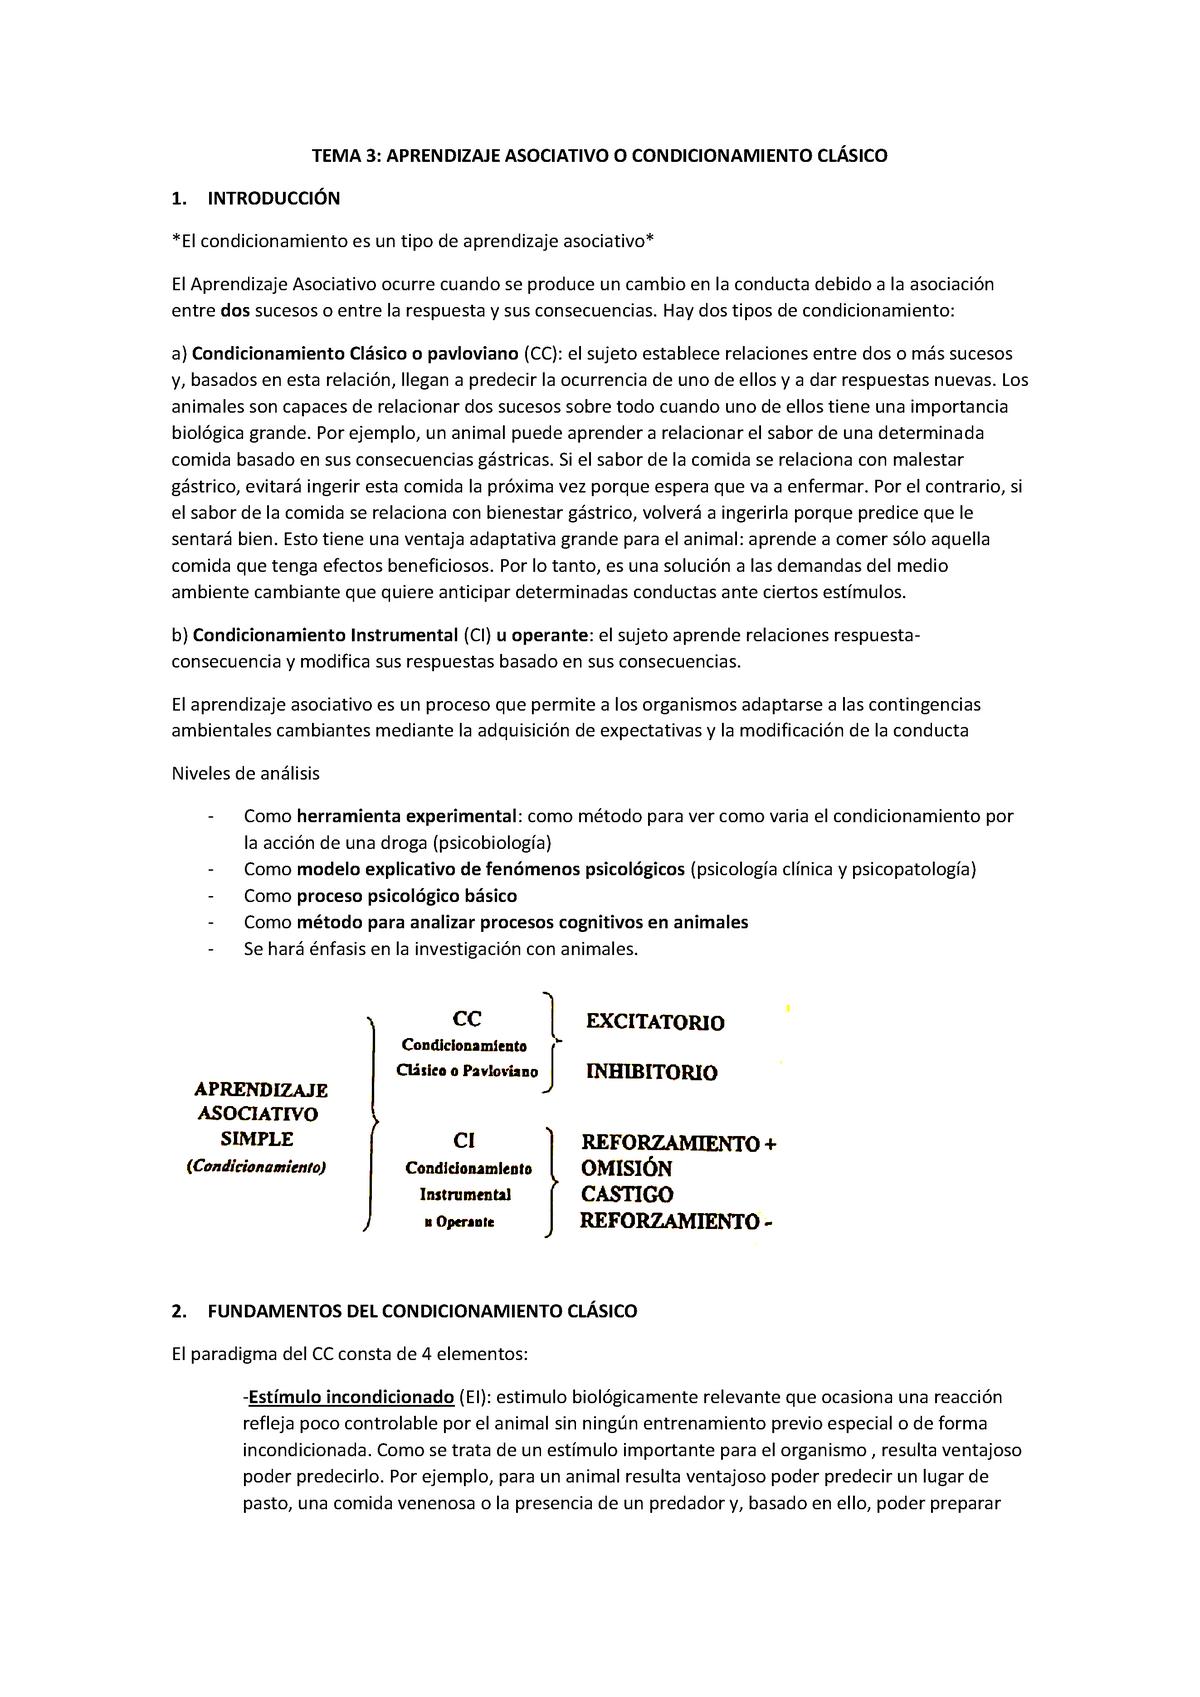 Citation metadata